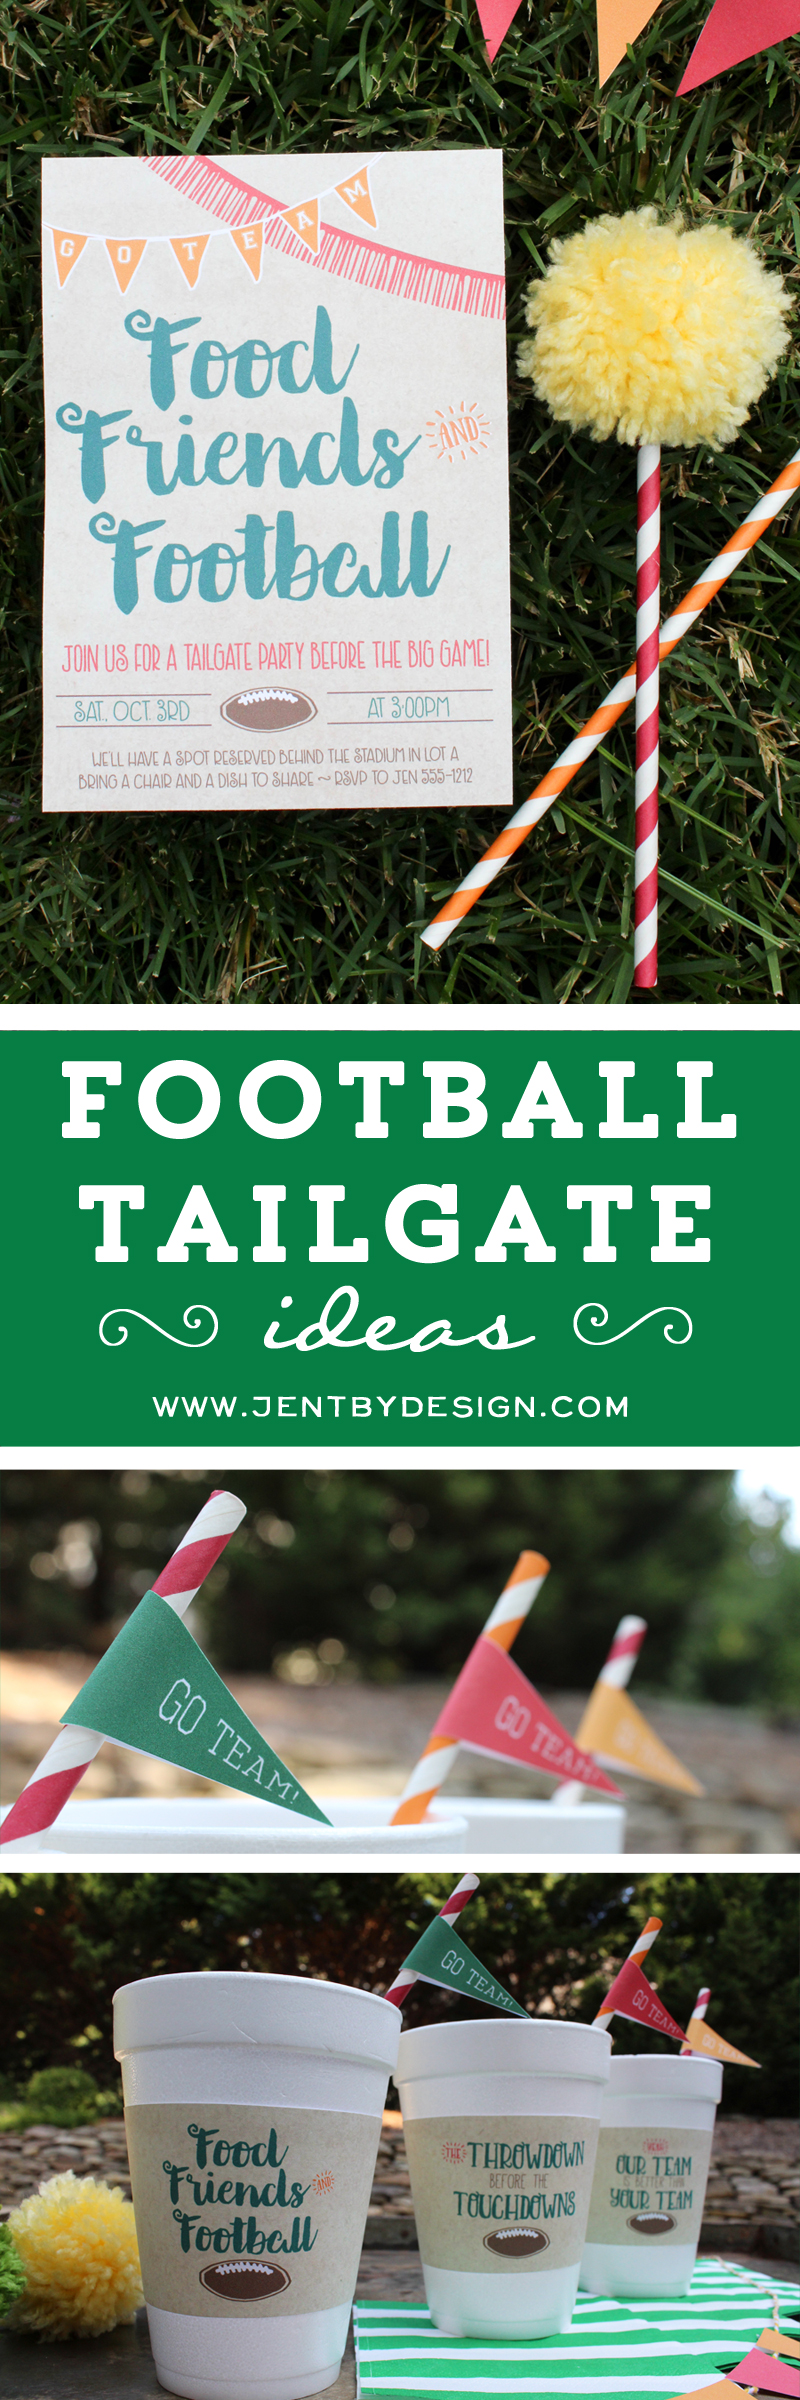 Football Tailgate Ideas - JenTbyDesign.com